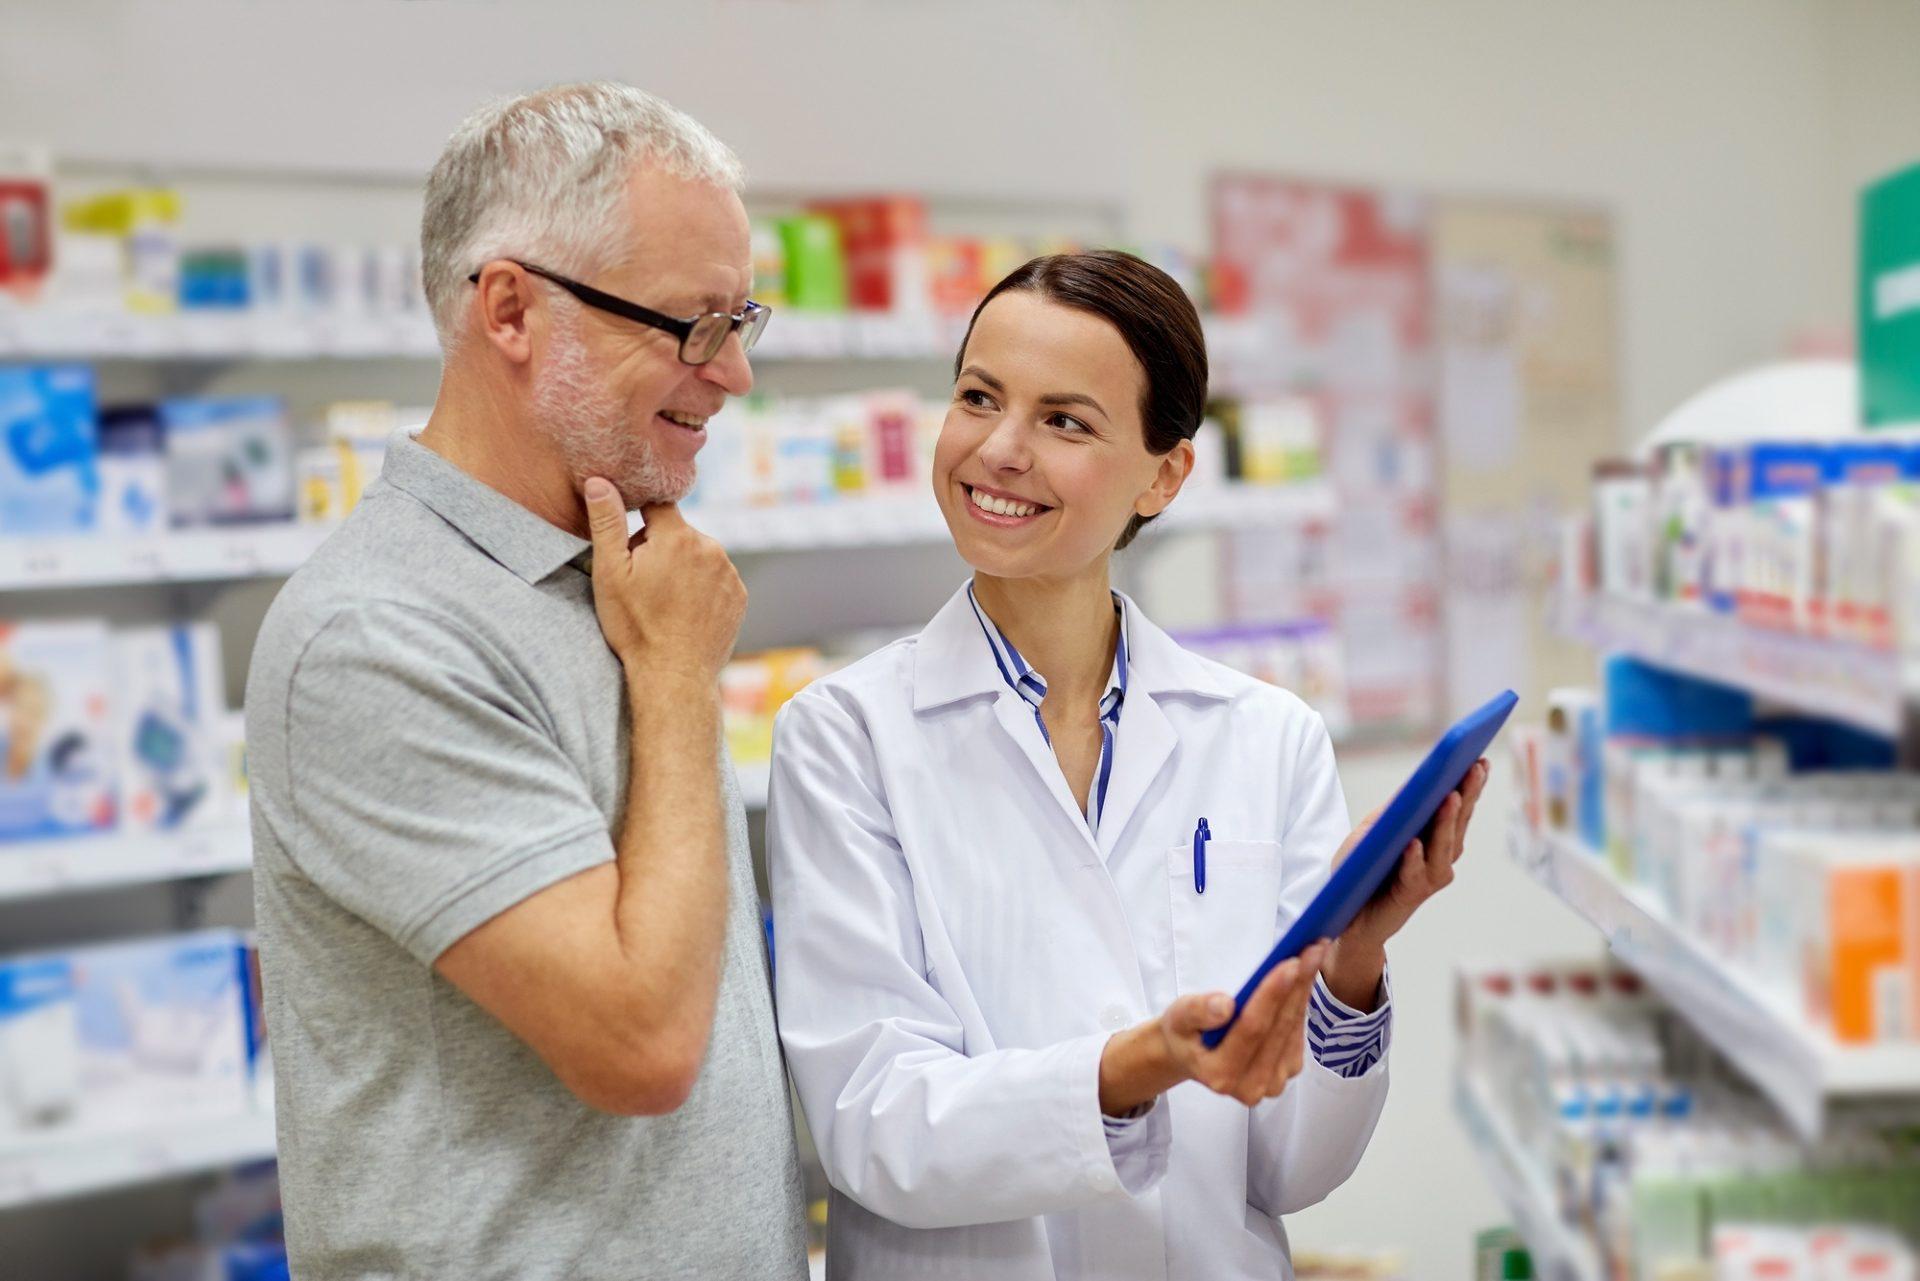 Medicamentos alopáticos: Características gerais